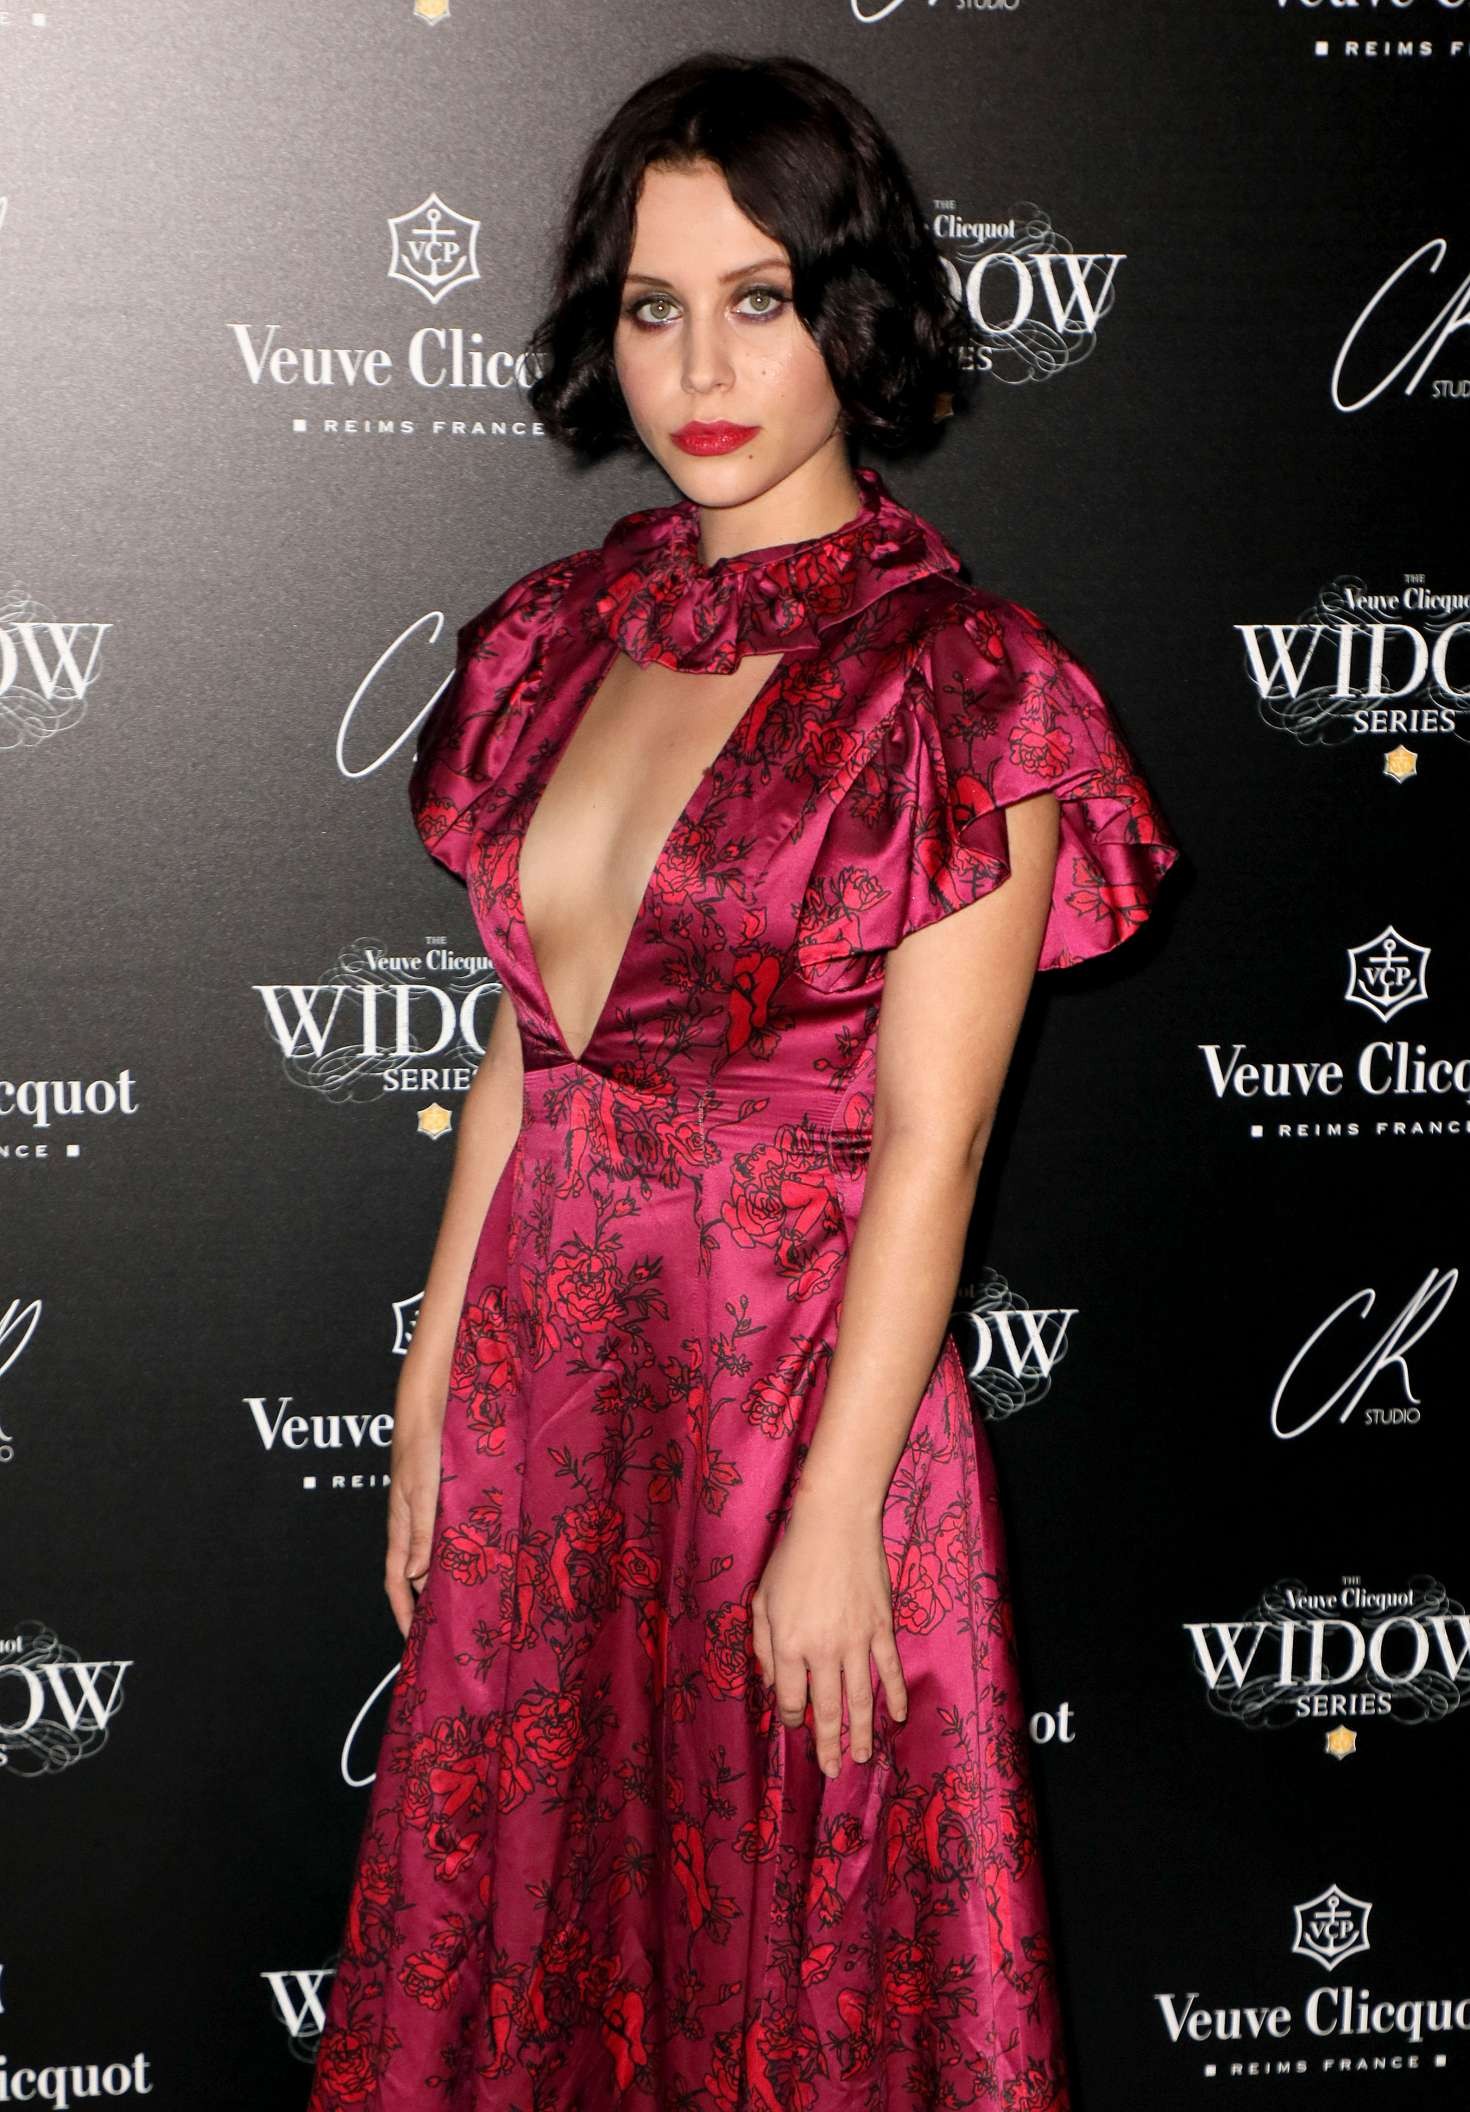 Billie Jd Porter The Veuve Clicquot Widow Series Vip